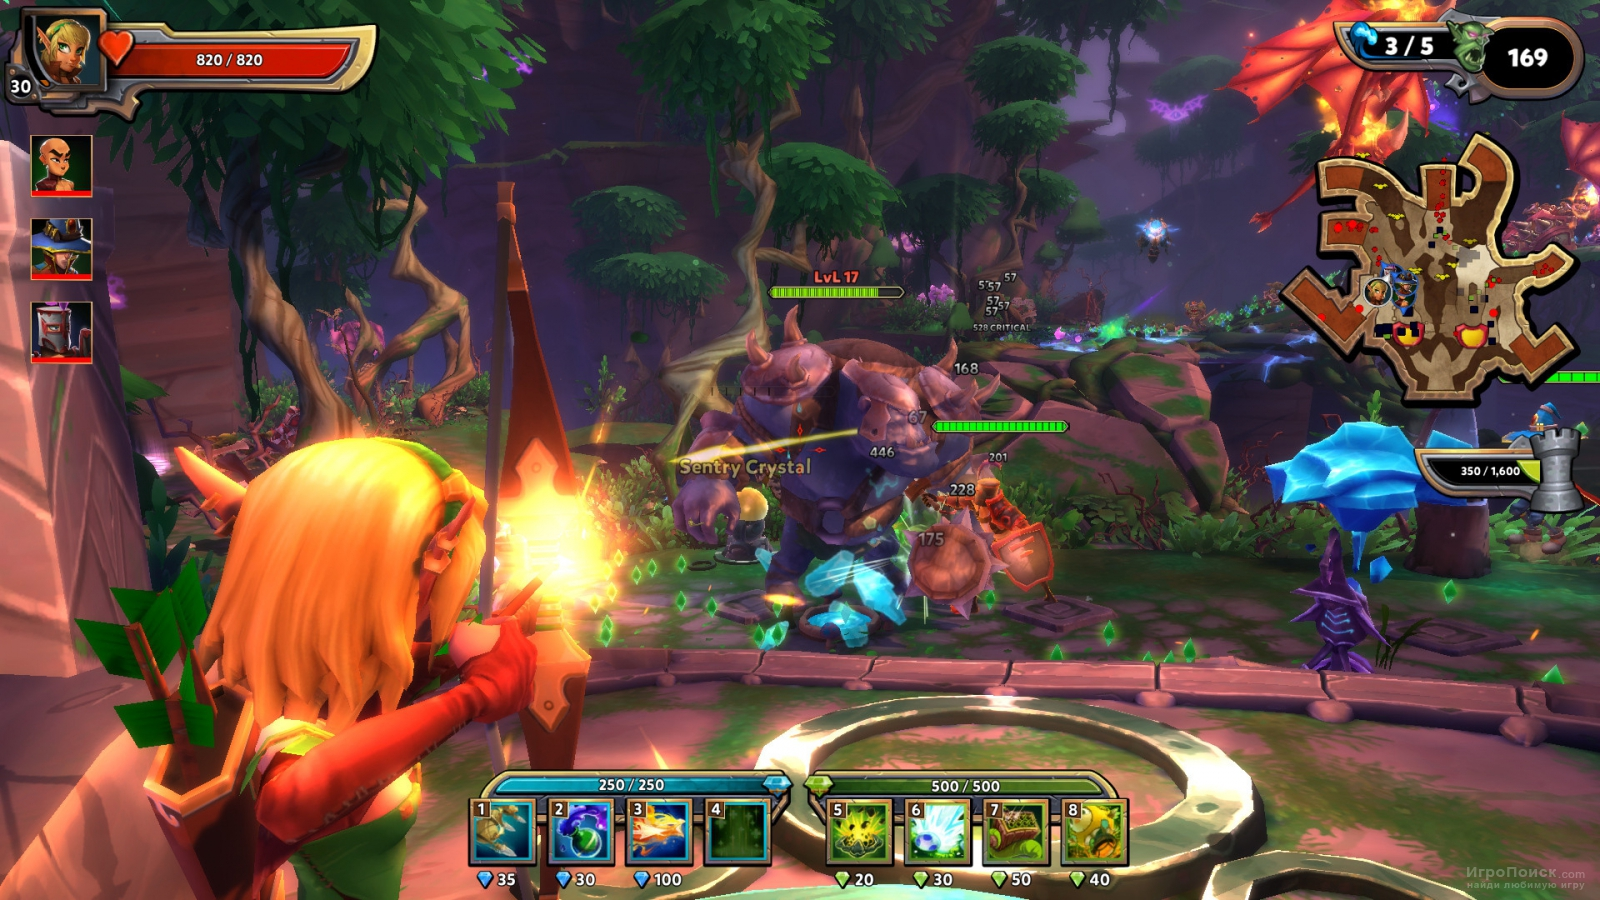 Скриншот к игре Dungeon Defenders II